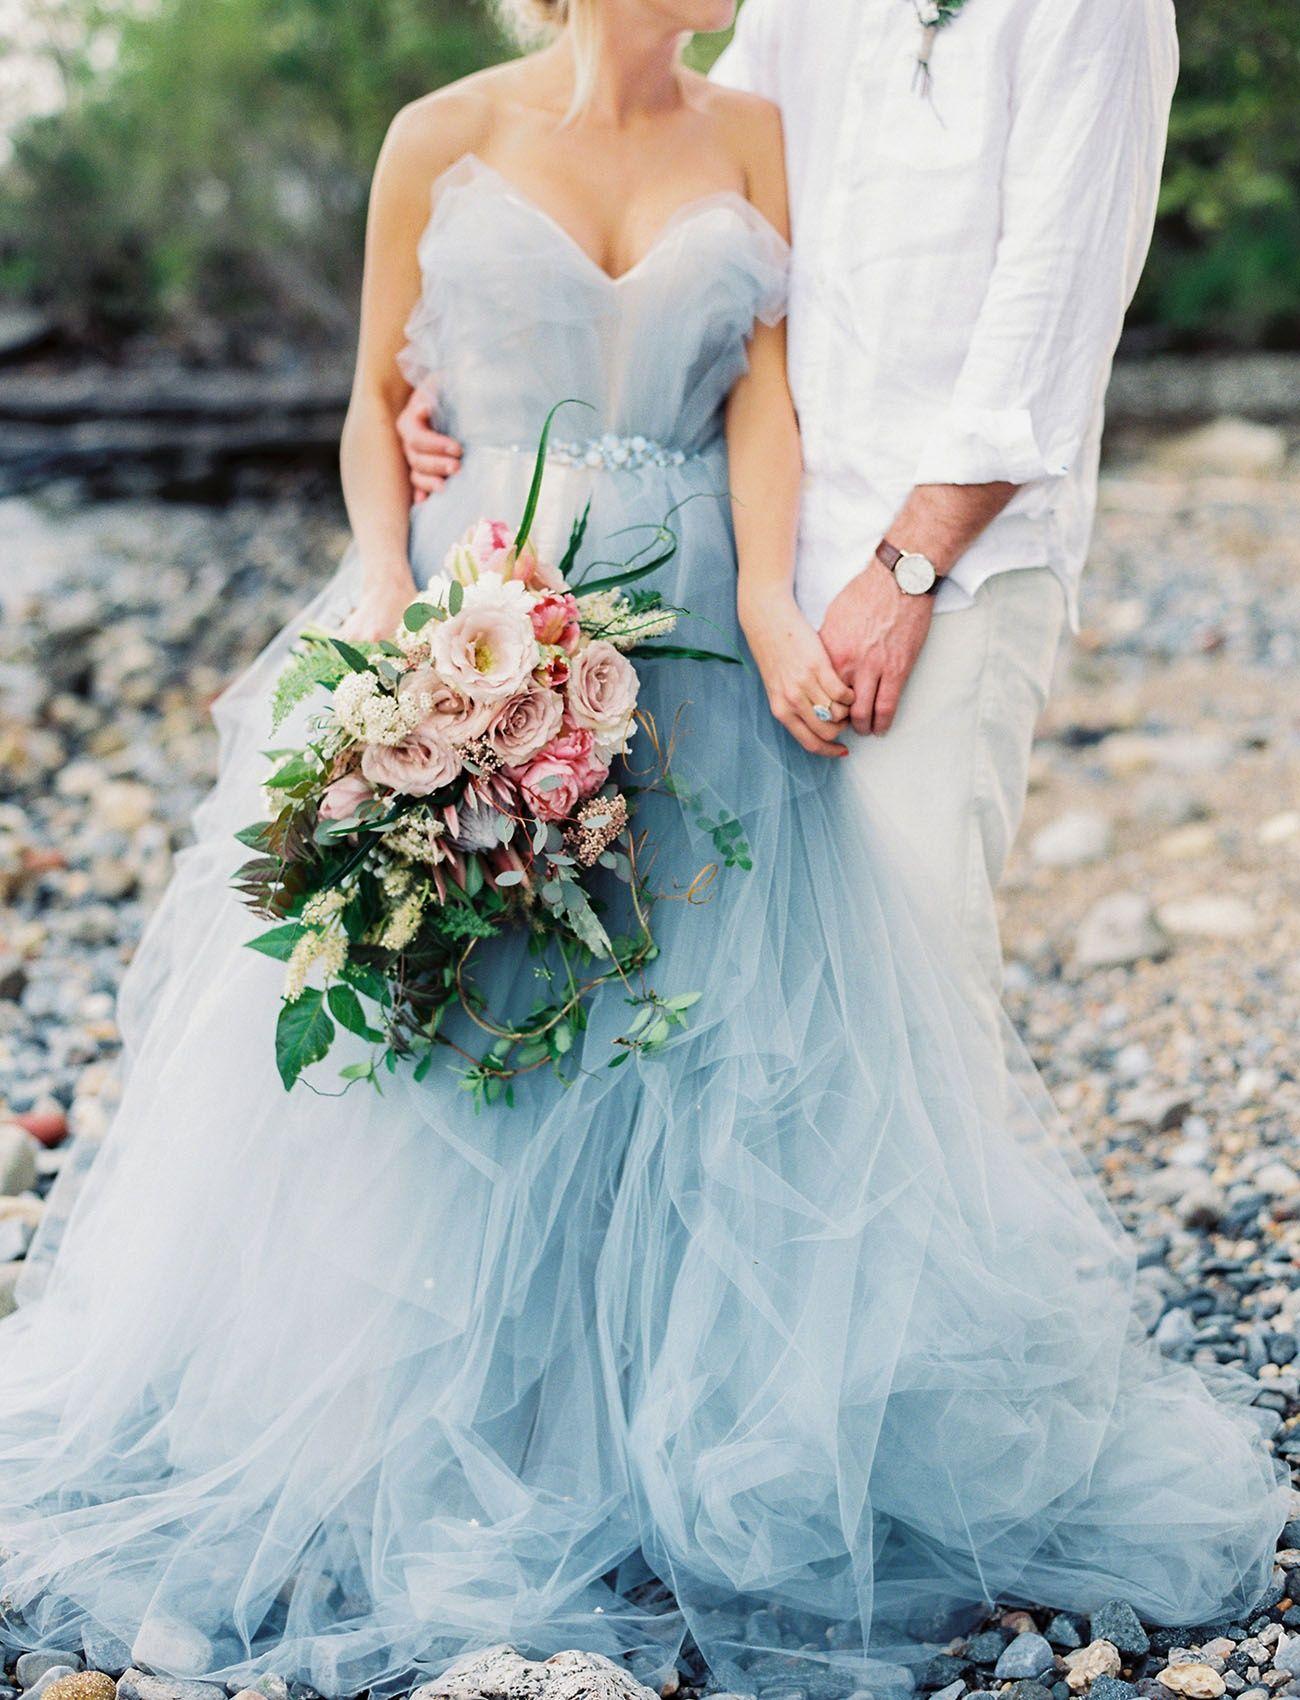 The latest wedding trend stunning serenity blue wedding dresses